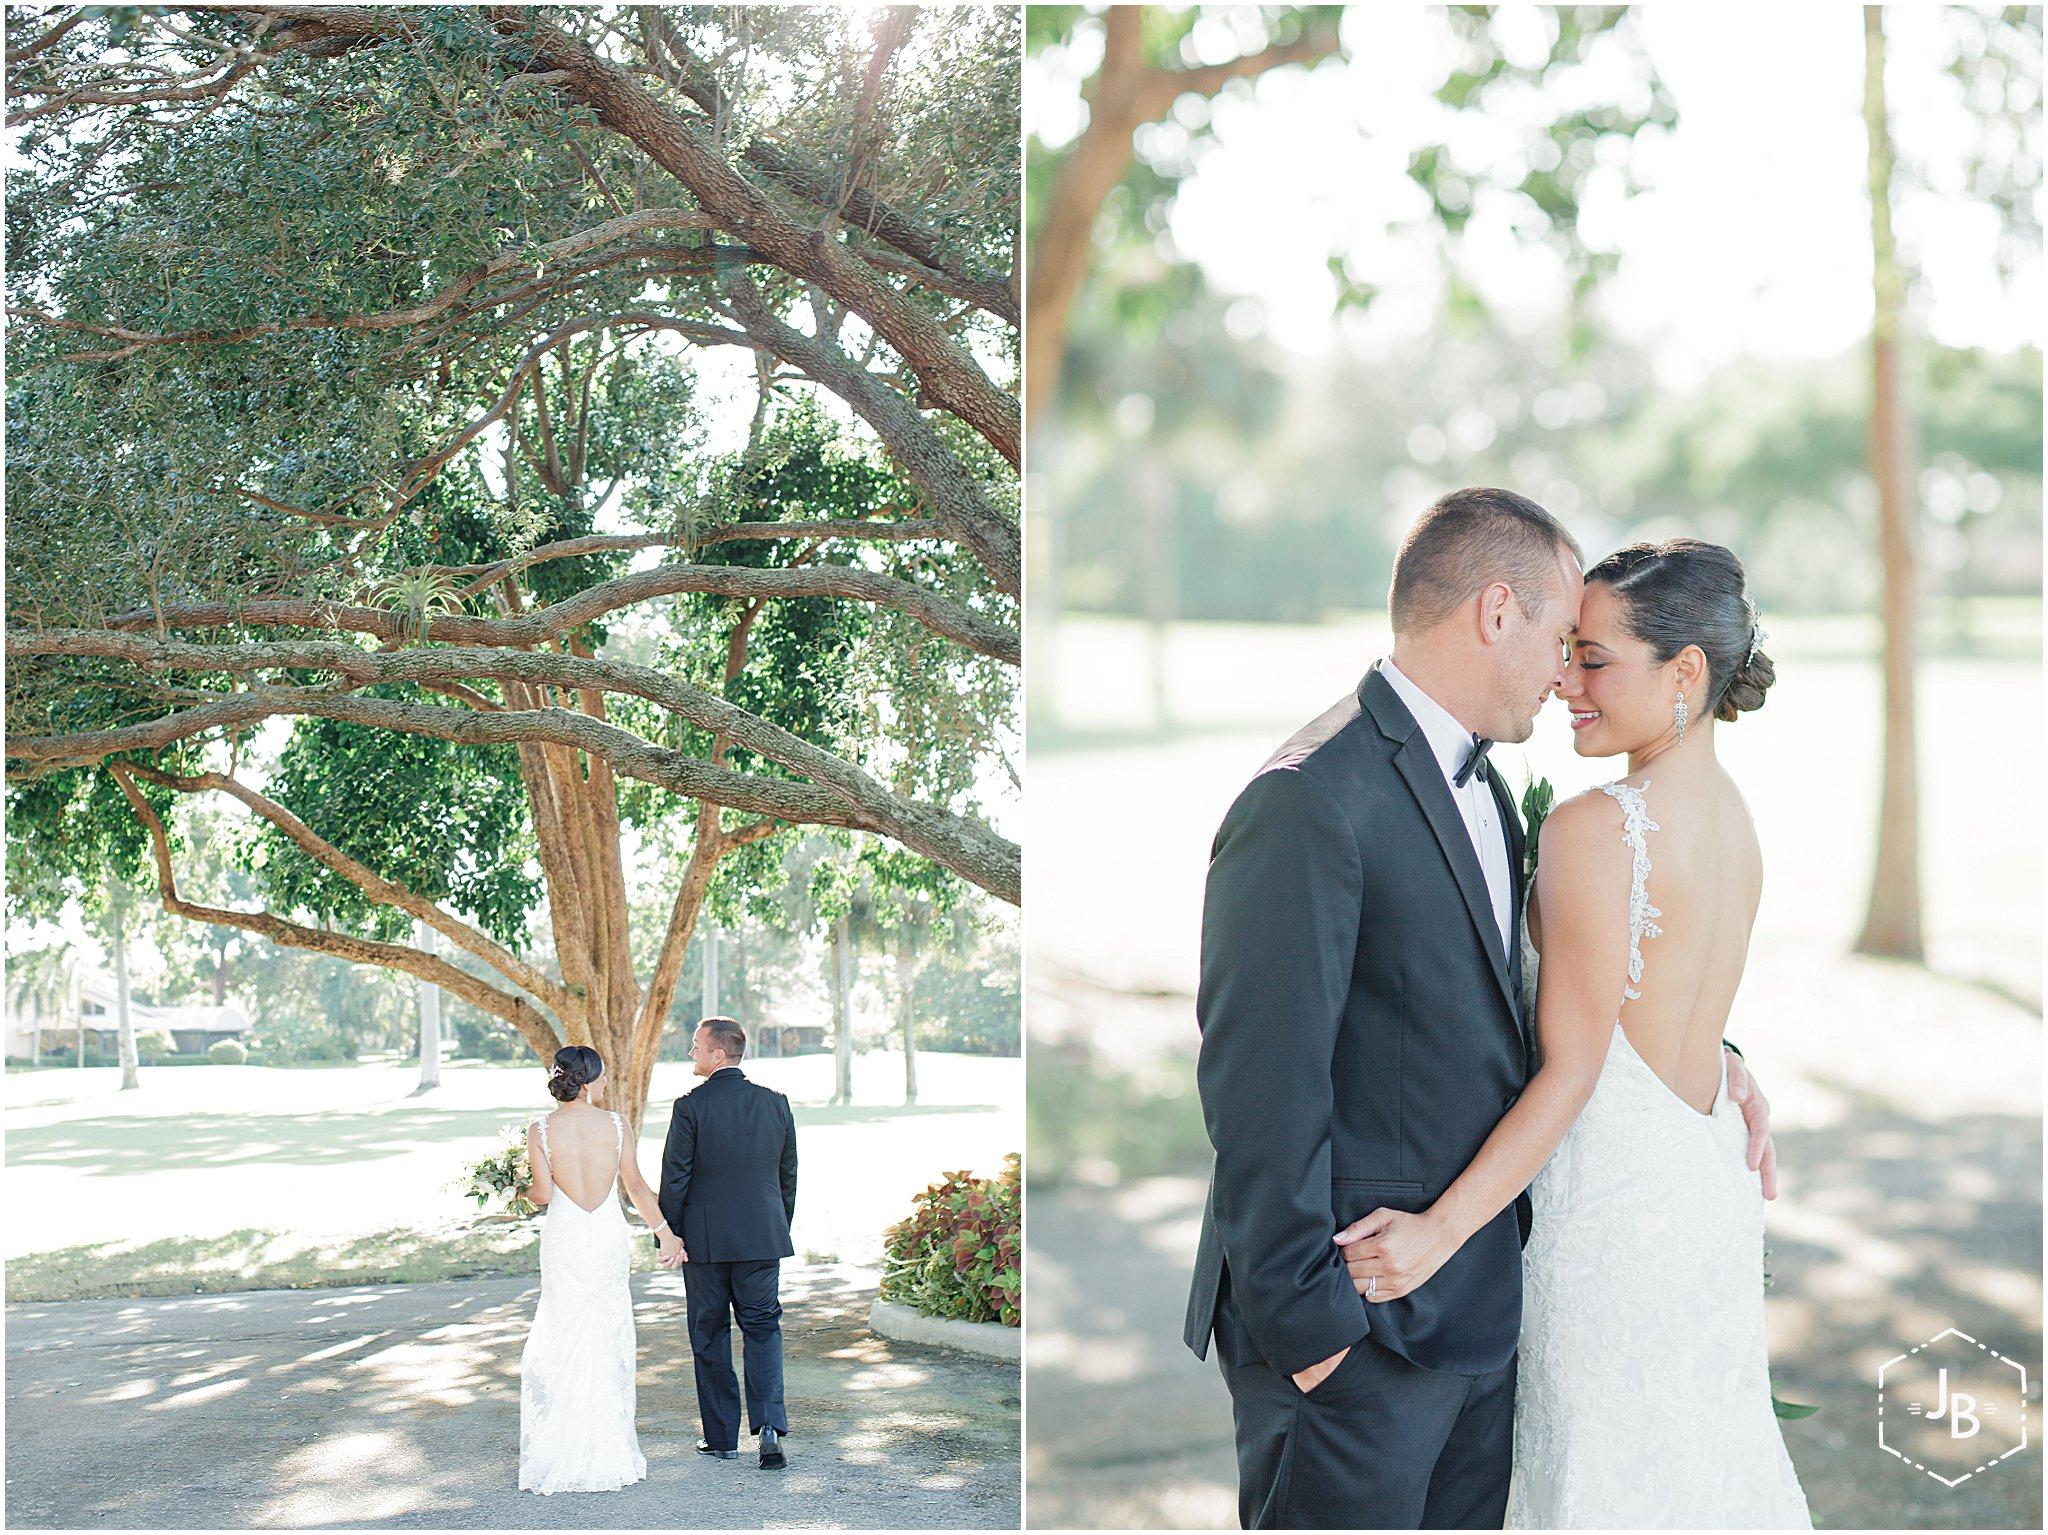 WeddingandEngagementFloridaPhotographer_0249.jpg